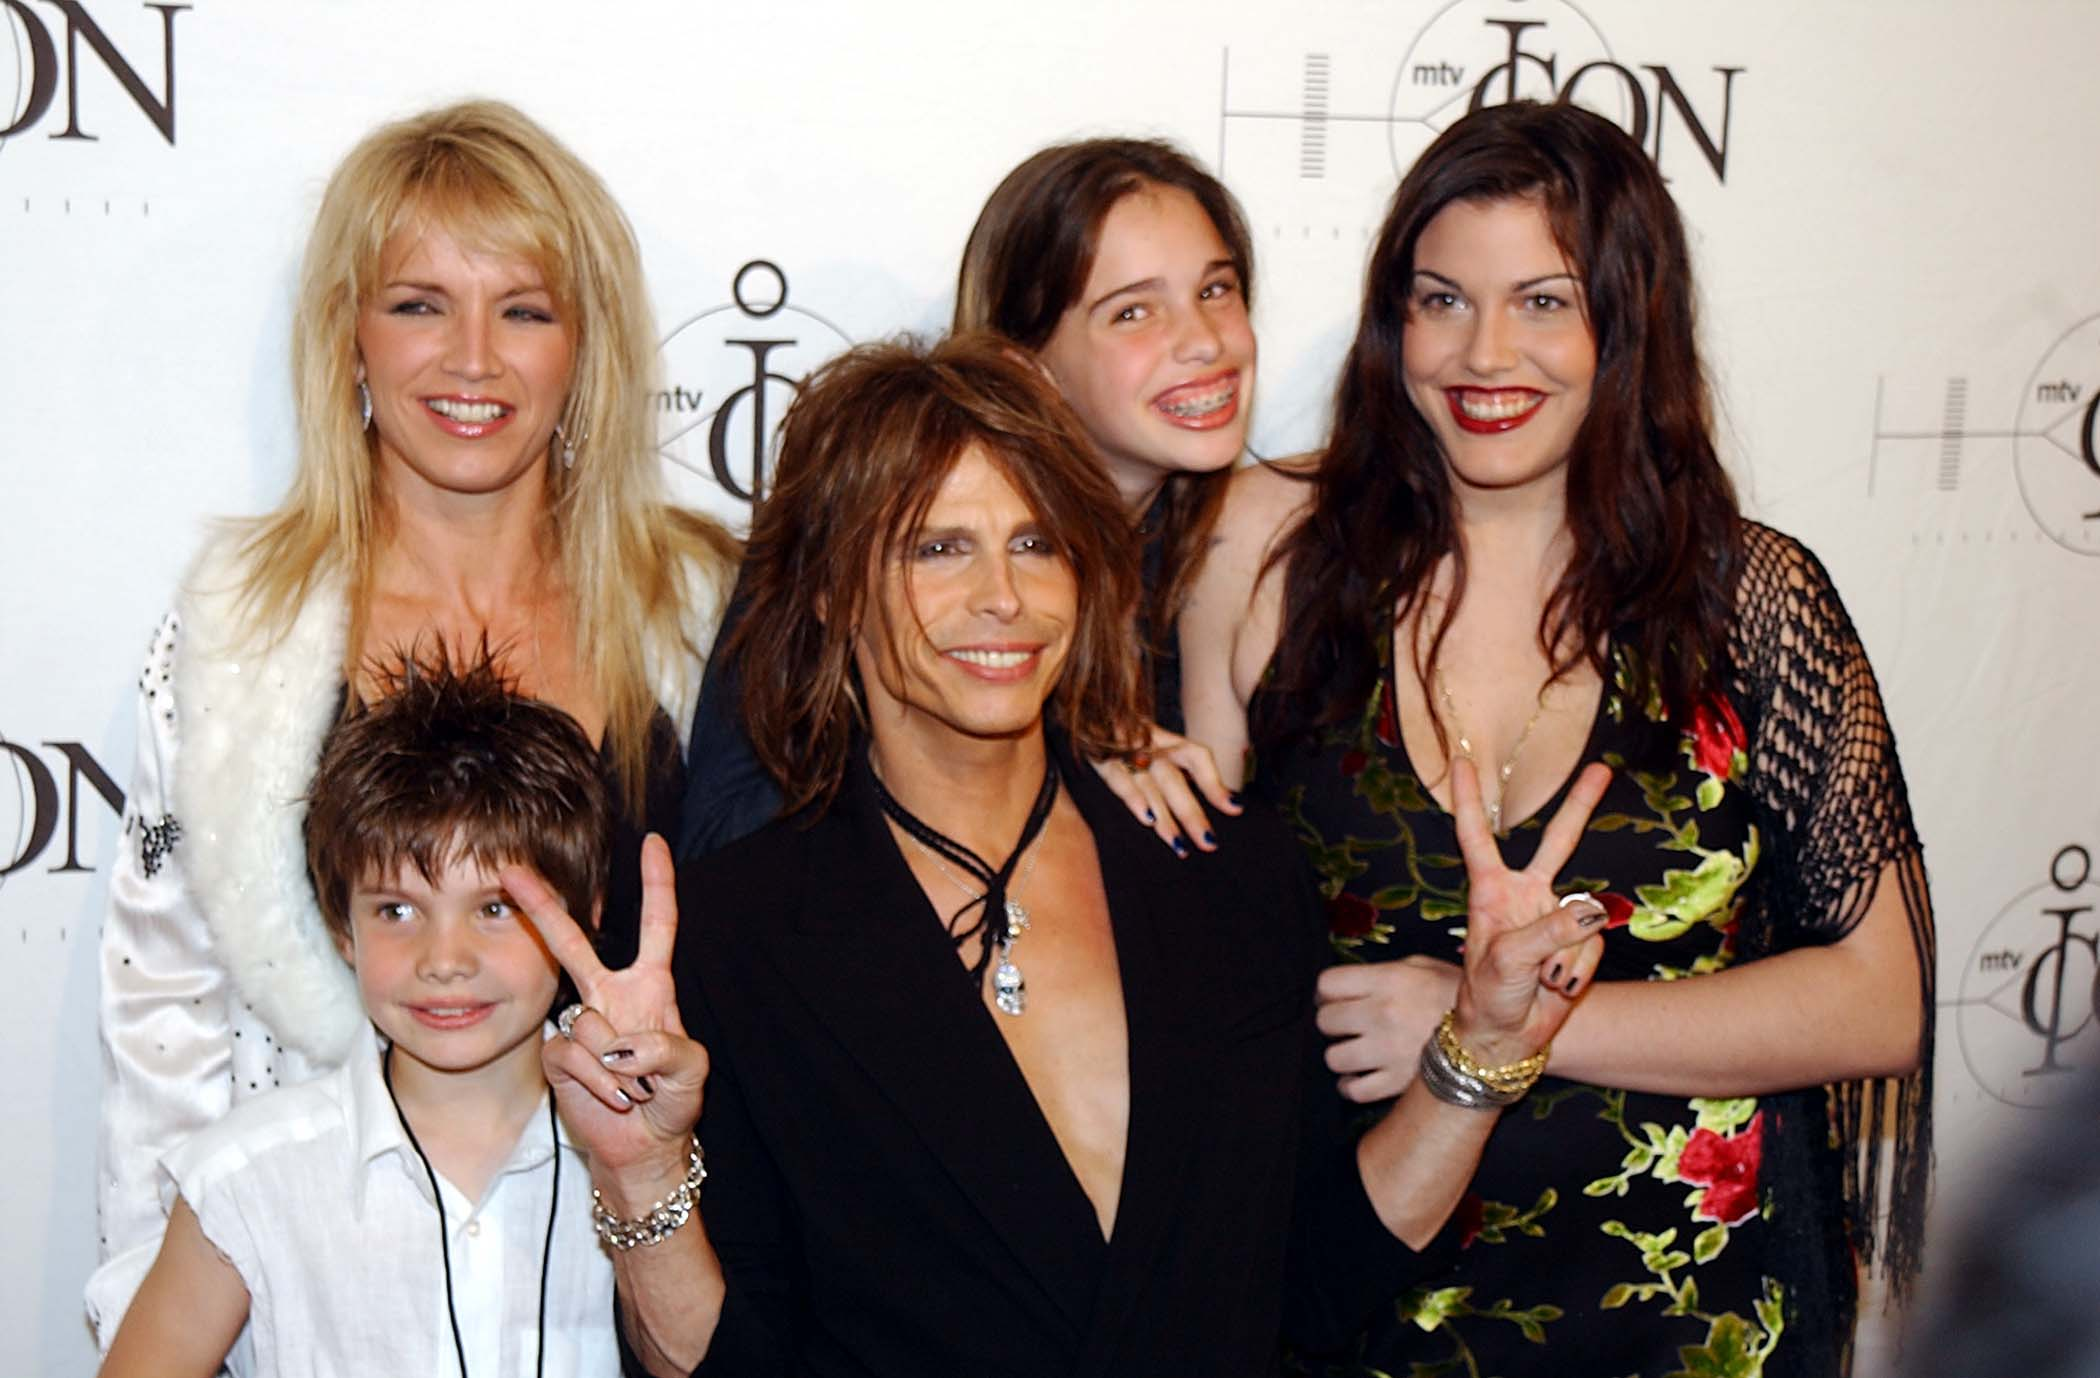 2002 MTV Icon Aerosmith - Arrivals